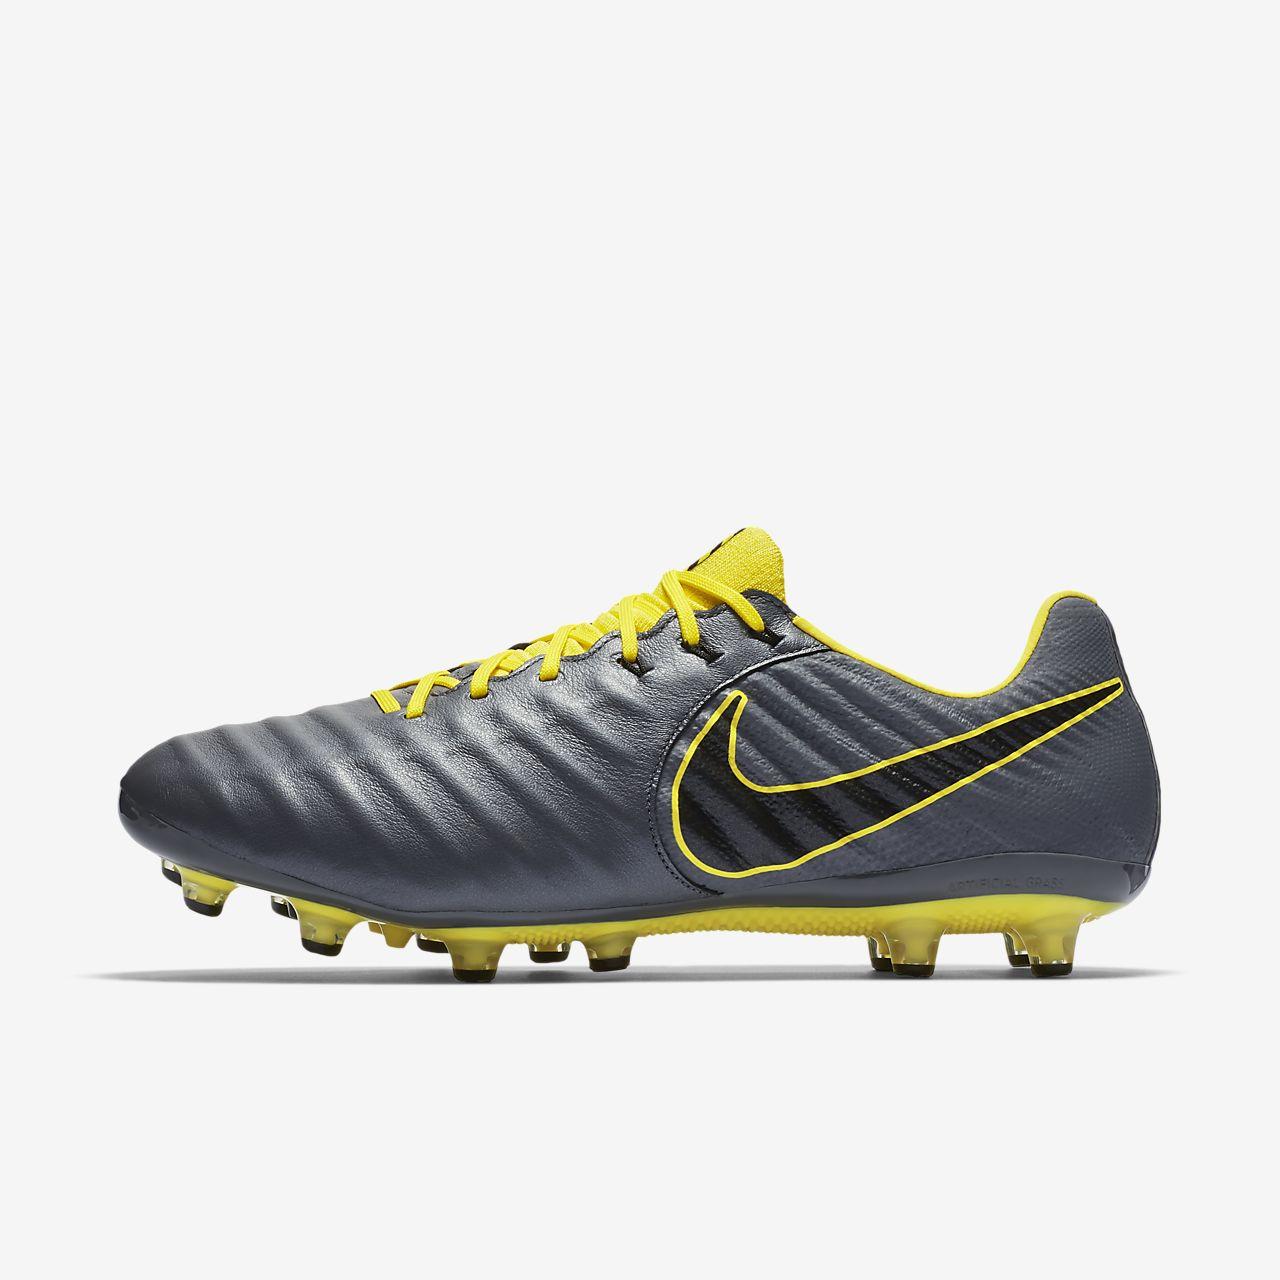 Vii kunstgras Voetbalschoen Ag Elite Nl Nike Pro Legend xHnqpYB8